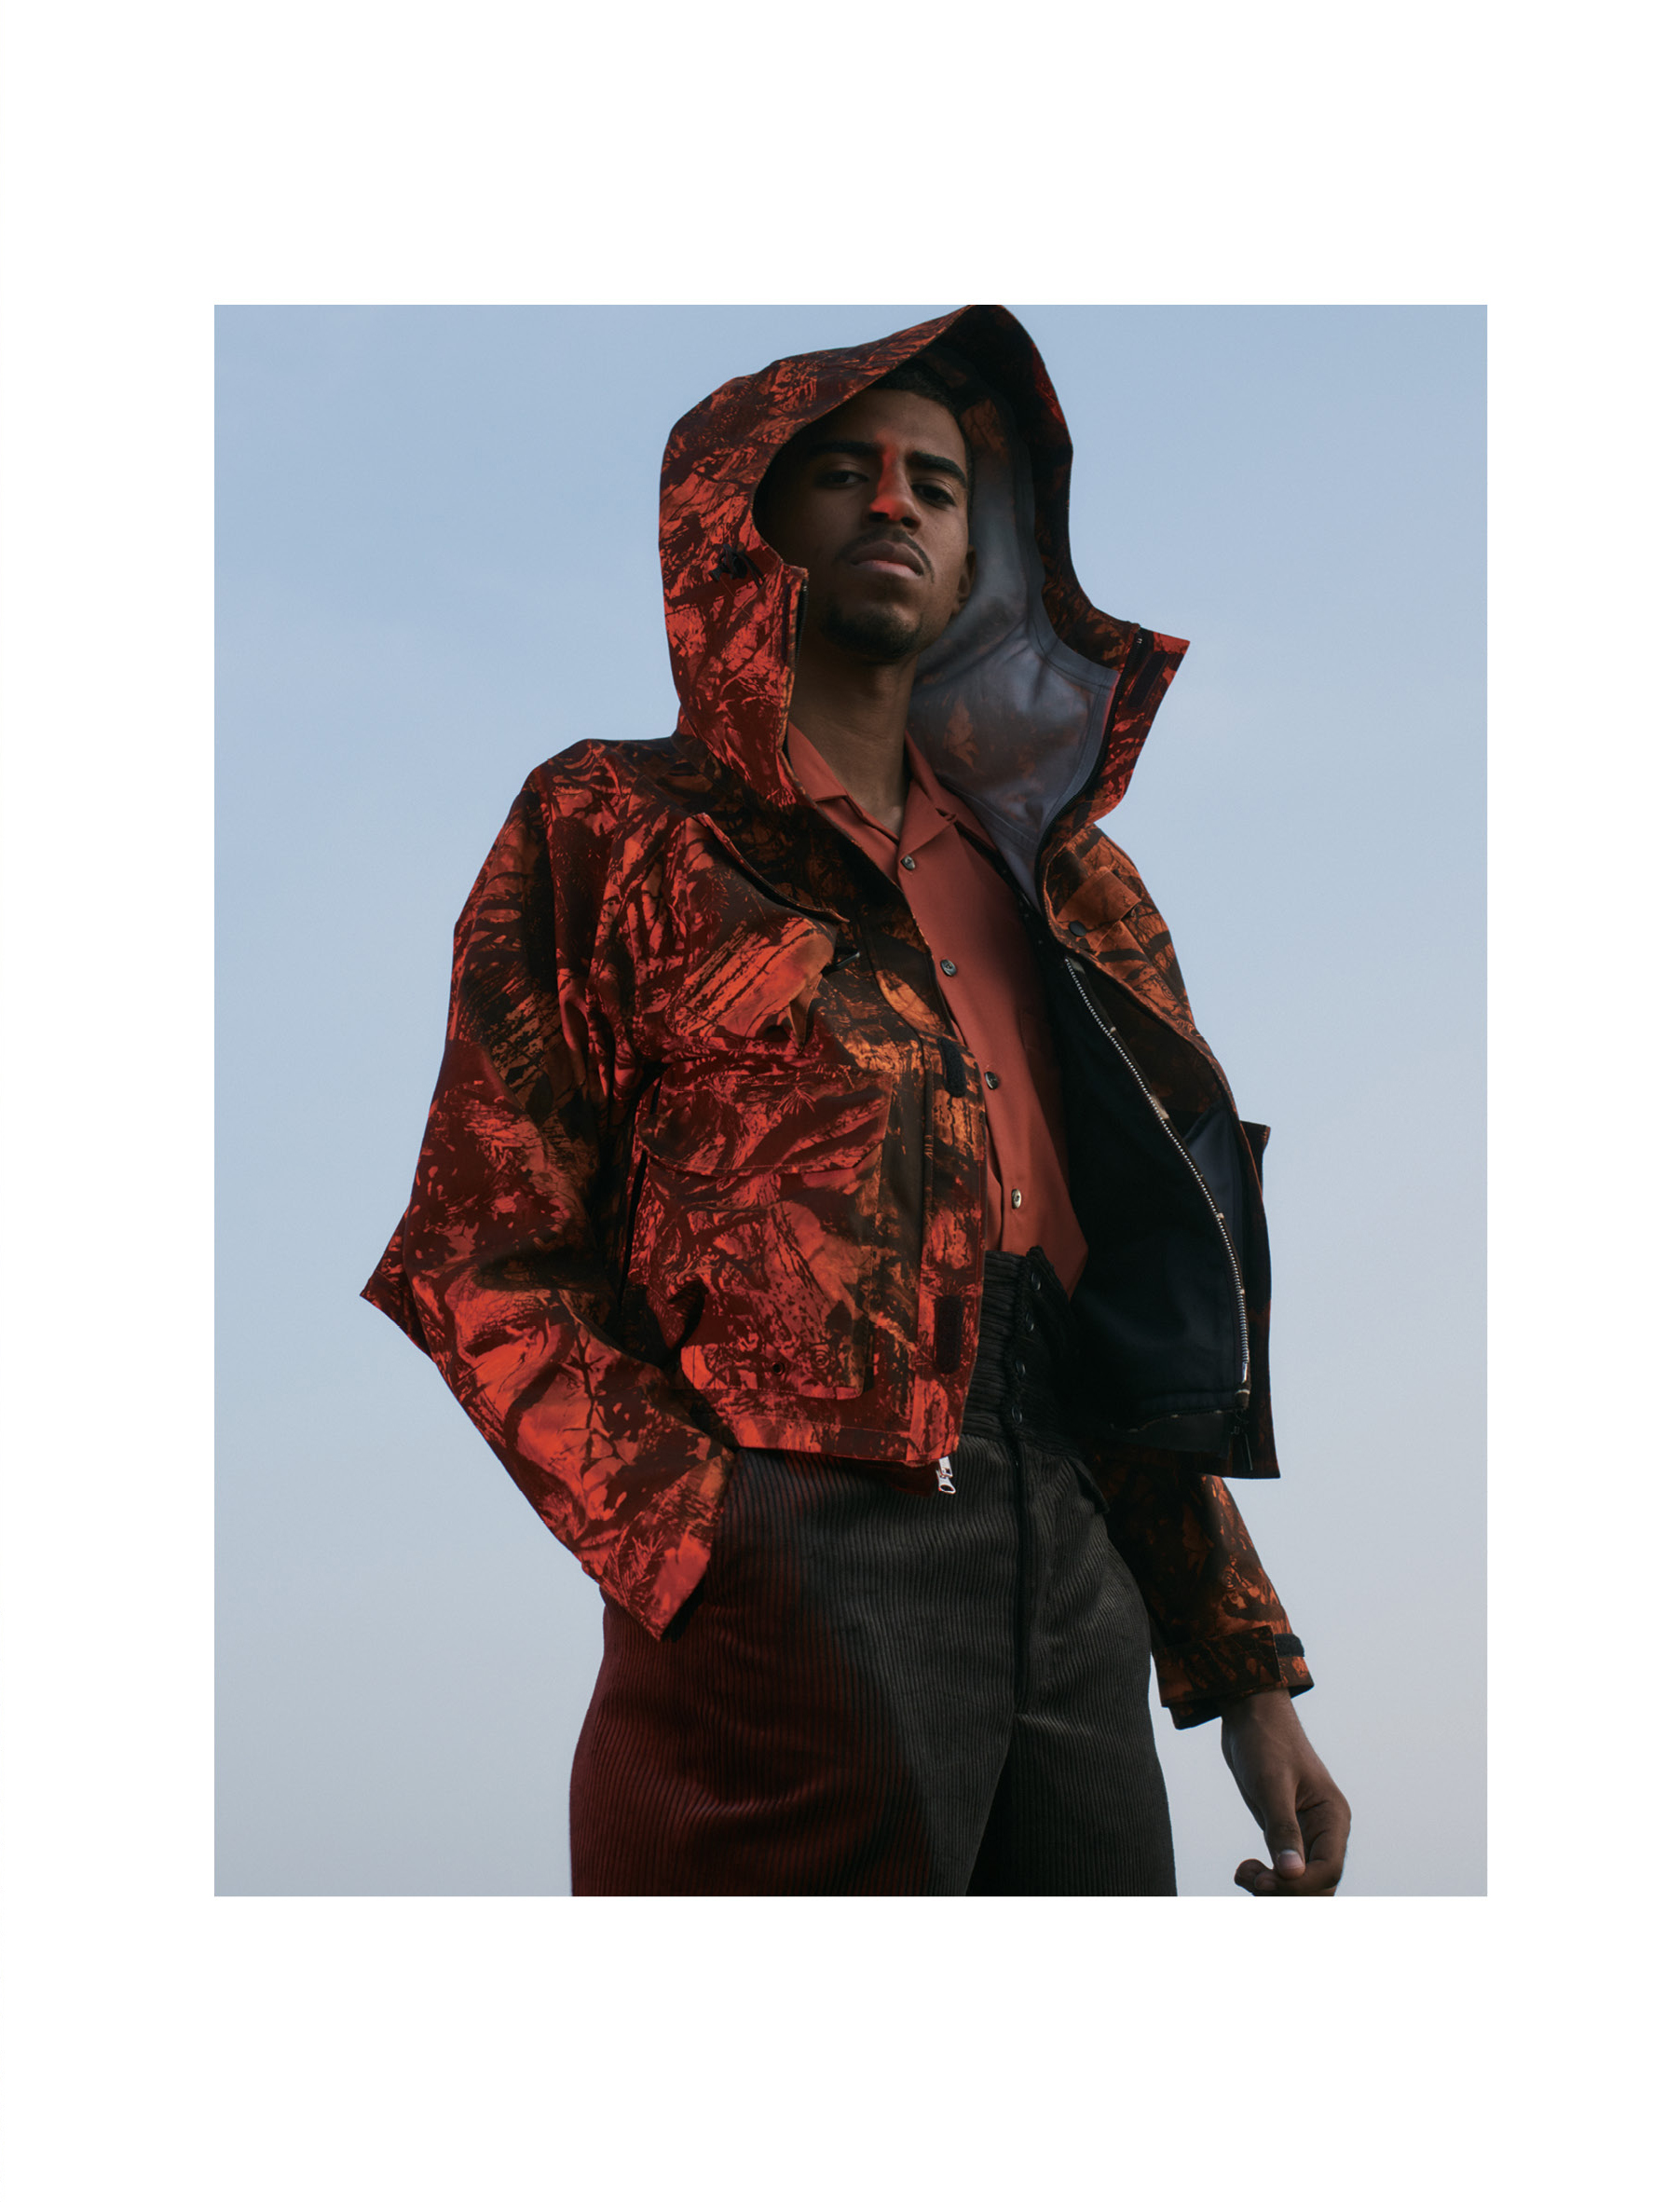 Both: Jacket - South2 West8, Shirt - Needles, Pants - _AïE, Shoes - Engineered Garments X Dr Martins